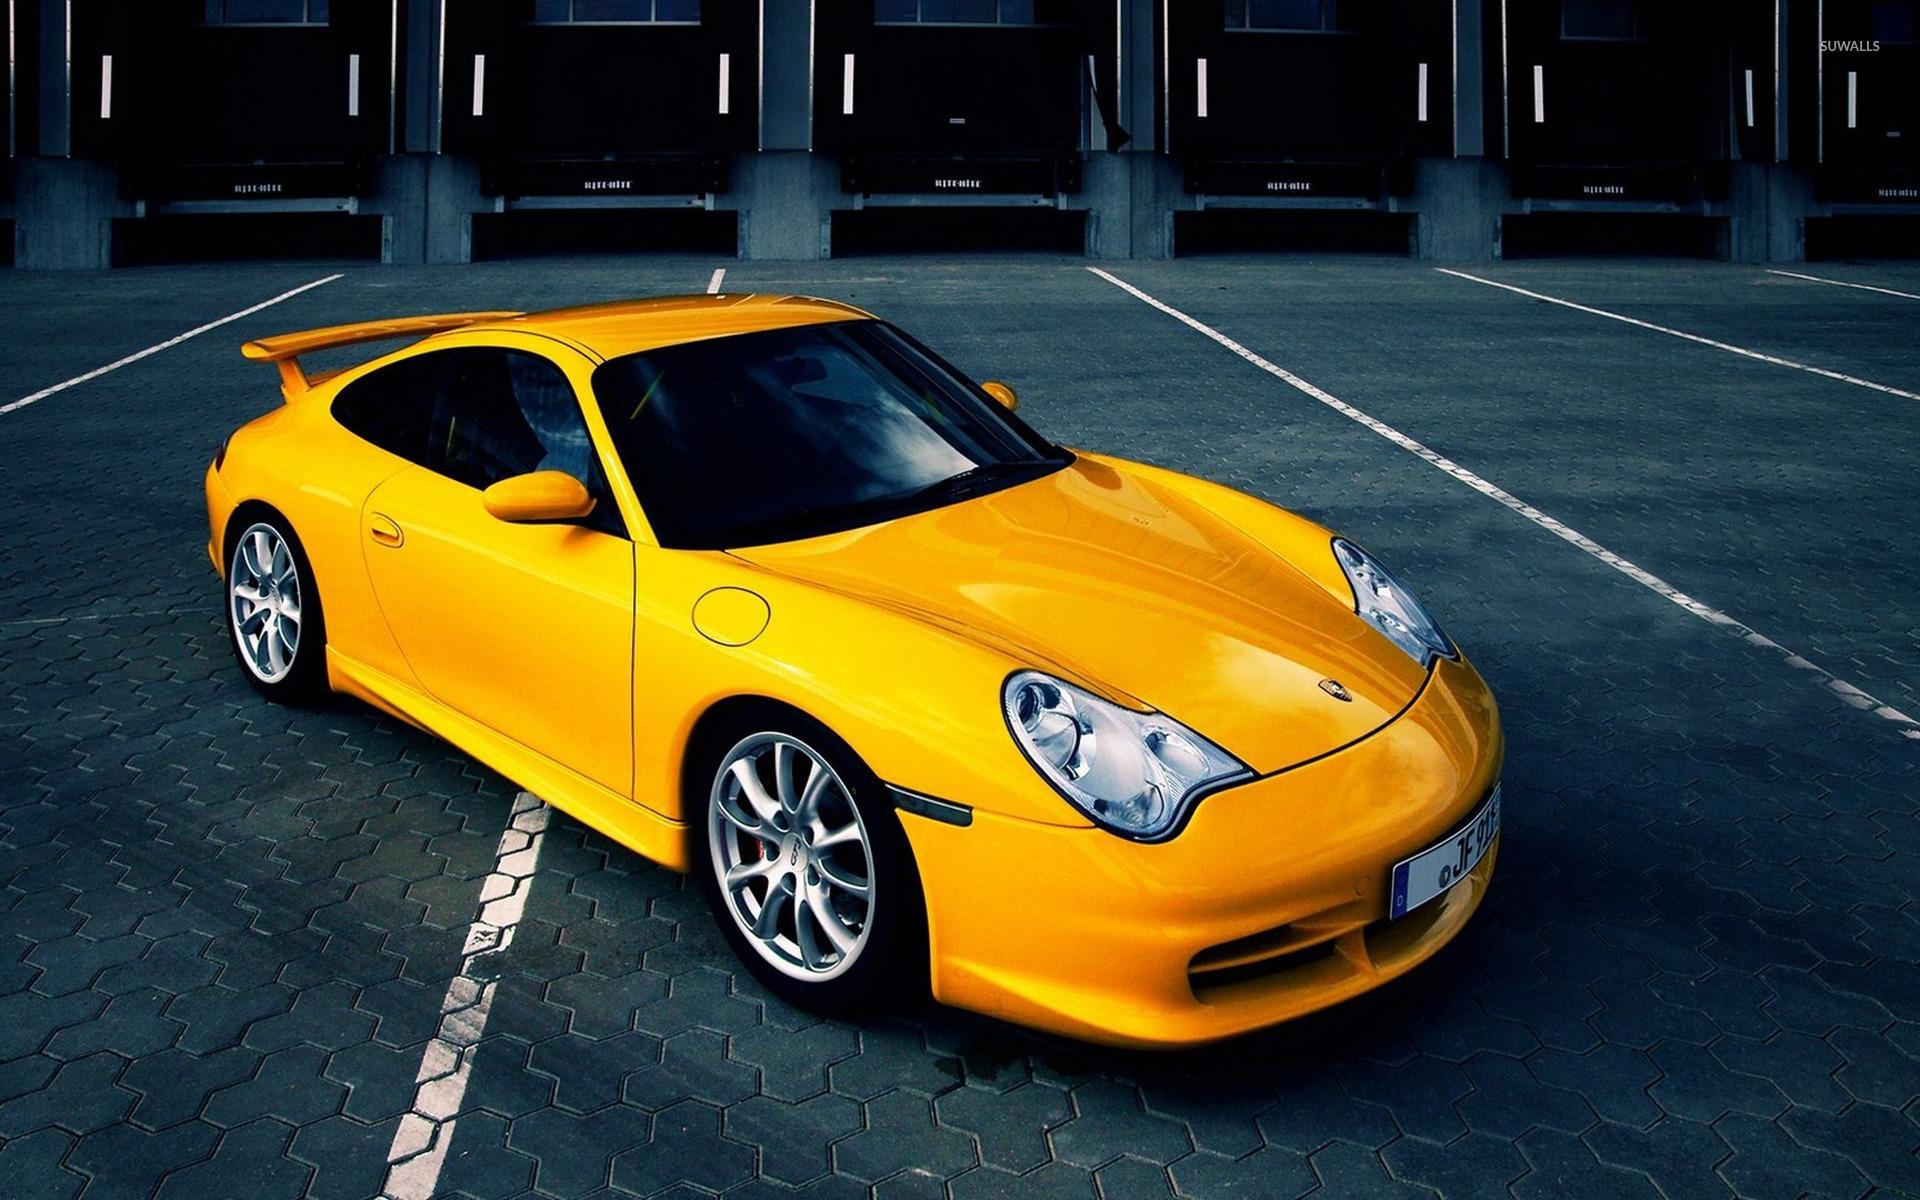 Chevrolet цены тестдрайвы отзывы форум фото видео